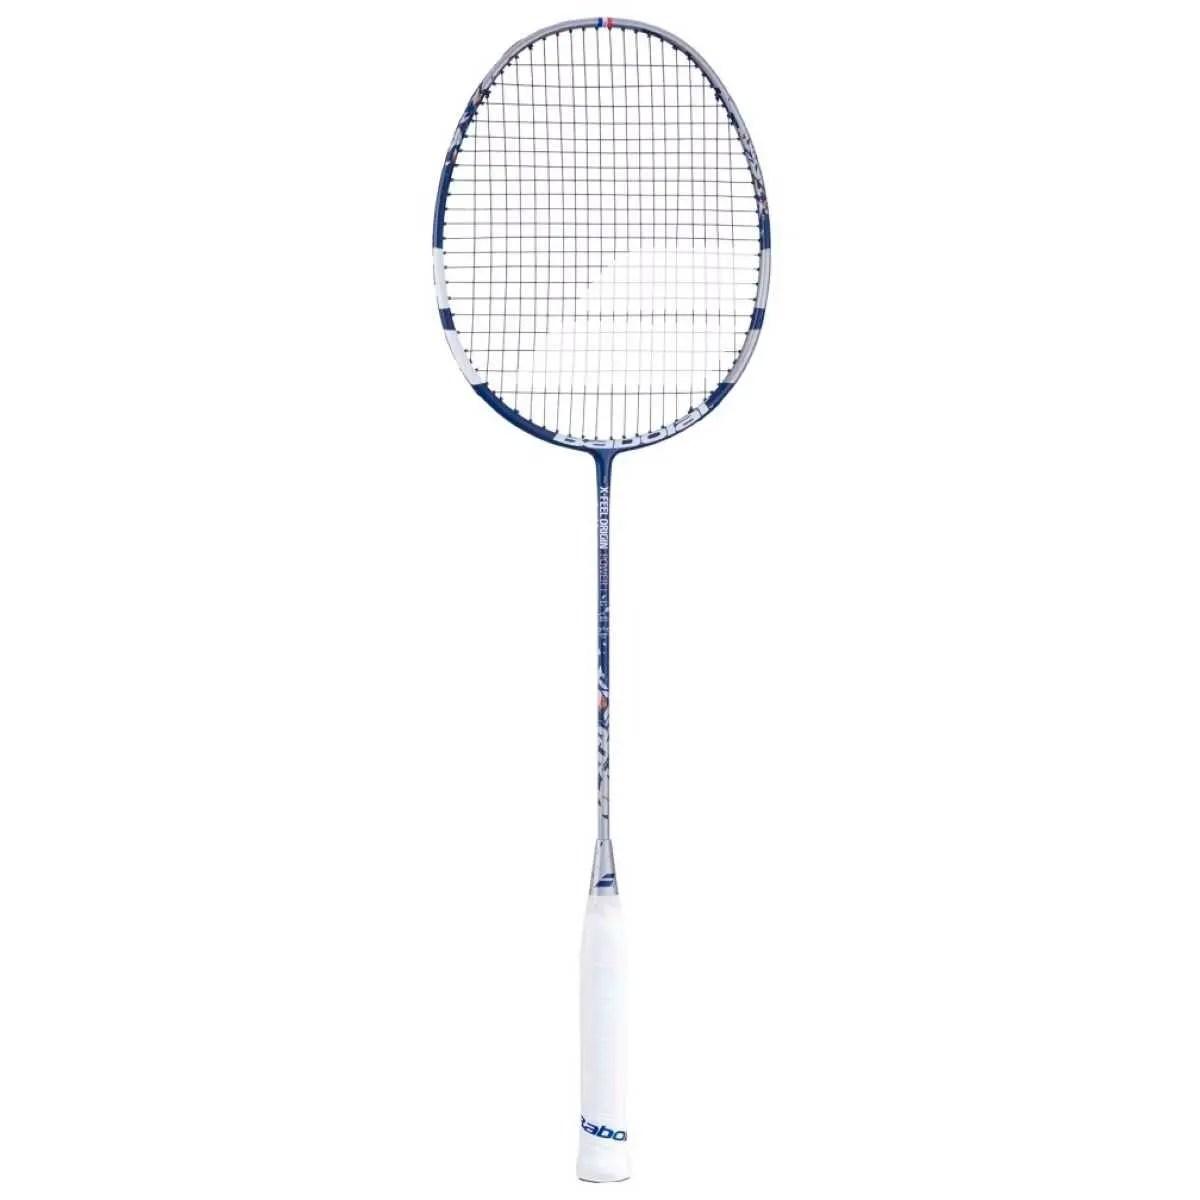 Buy Babolat X Feel Origin Power Badminton Racket Online India